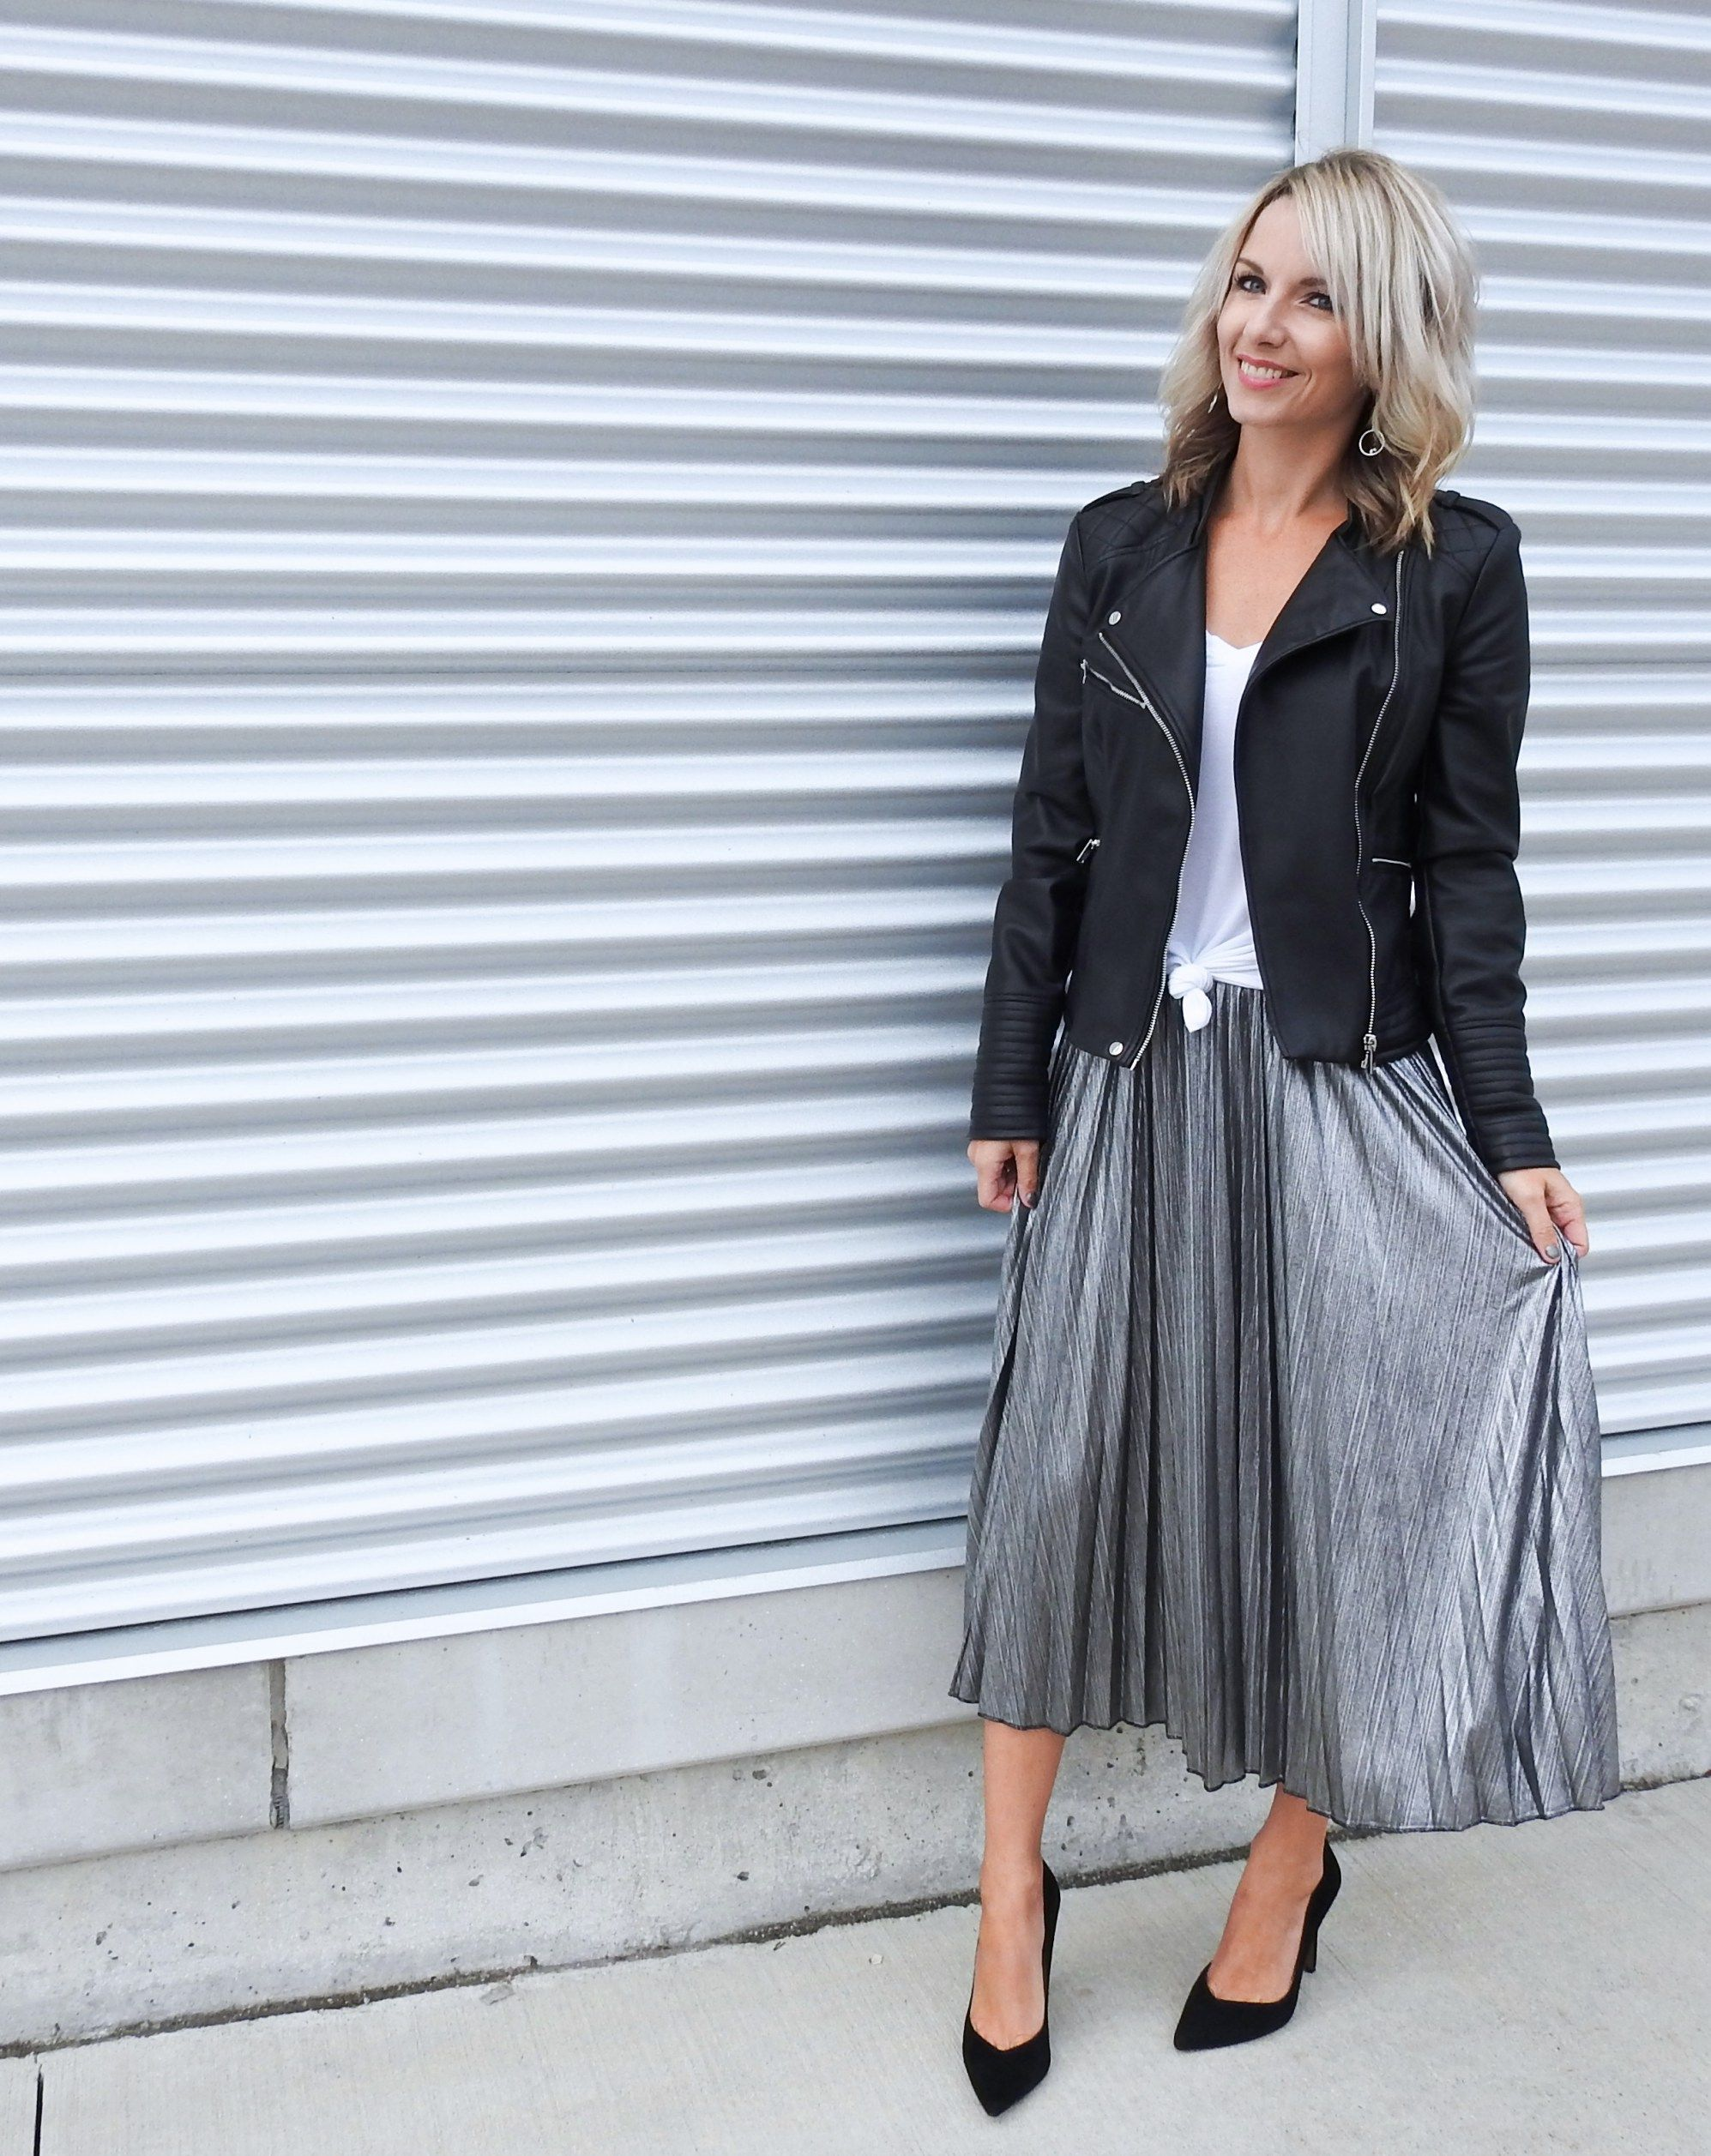 356e807449 Black leather jacket moto, silver pleated midi skirt, black suede pumps,  Adidas superstars, white tee, tiaras and heels blog